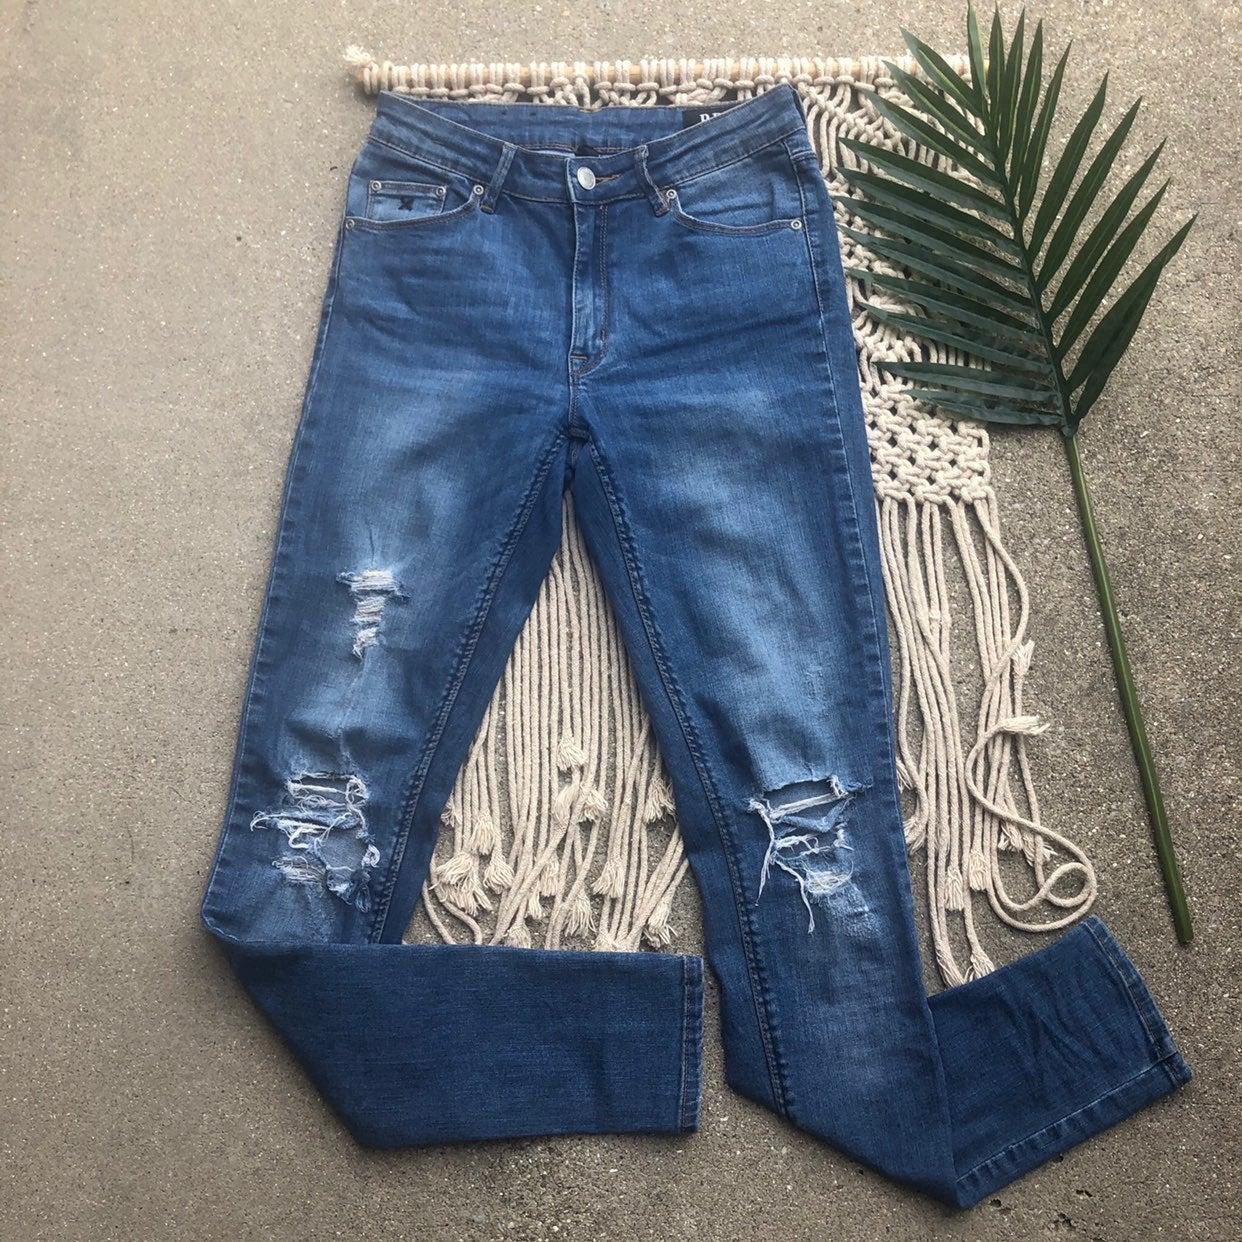 RES Denim Distressed Skinny Jeans 27